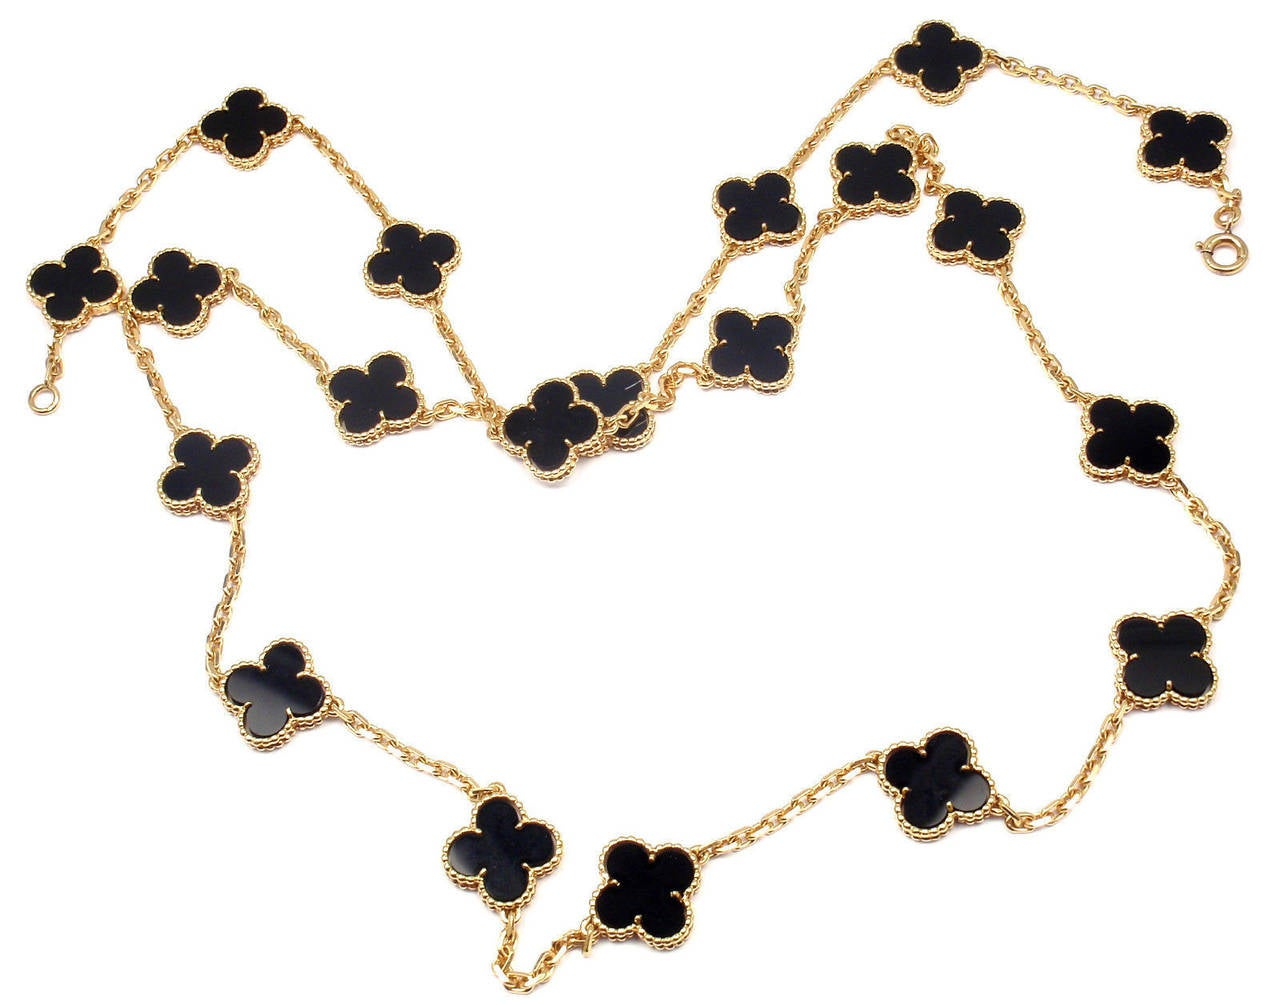 Van Cleef & Arpels Vintage Alhambra Twenty-Motif Black Onyx Gold Necklace 9